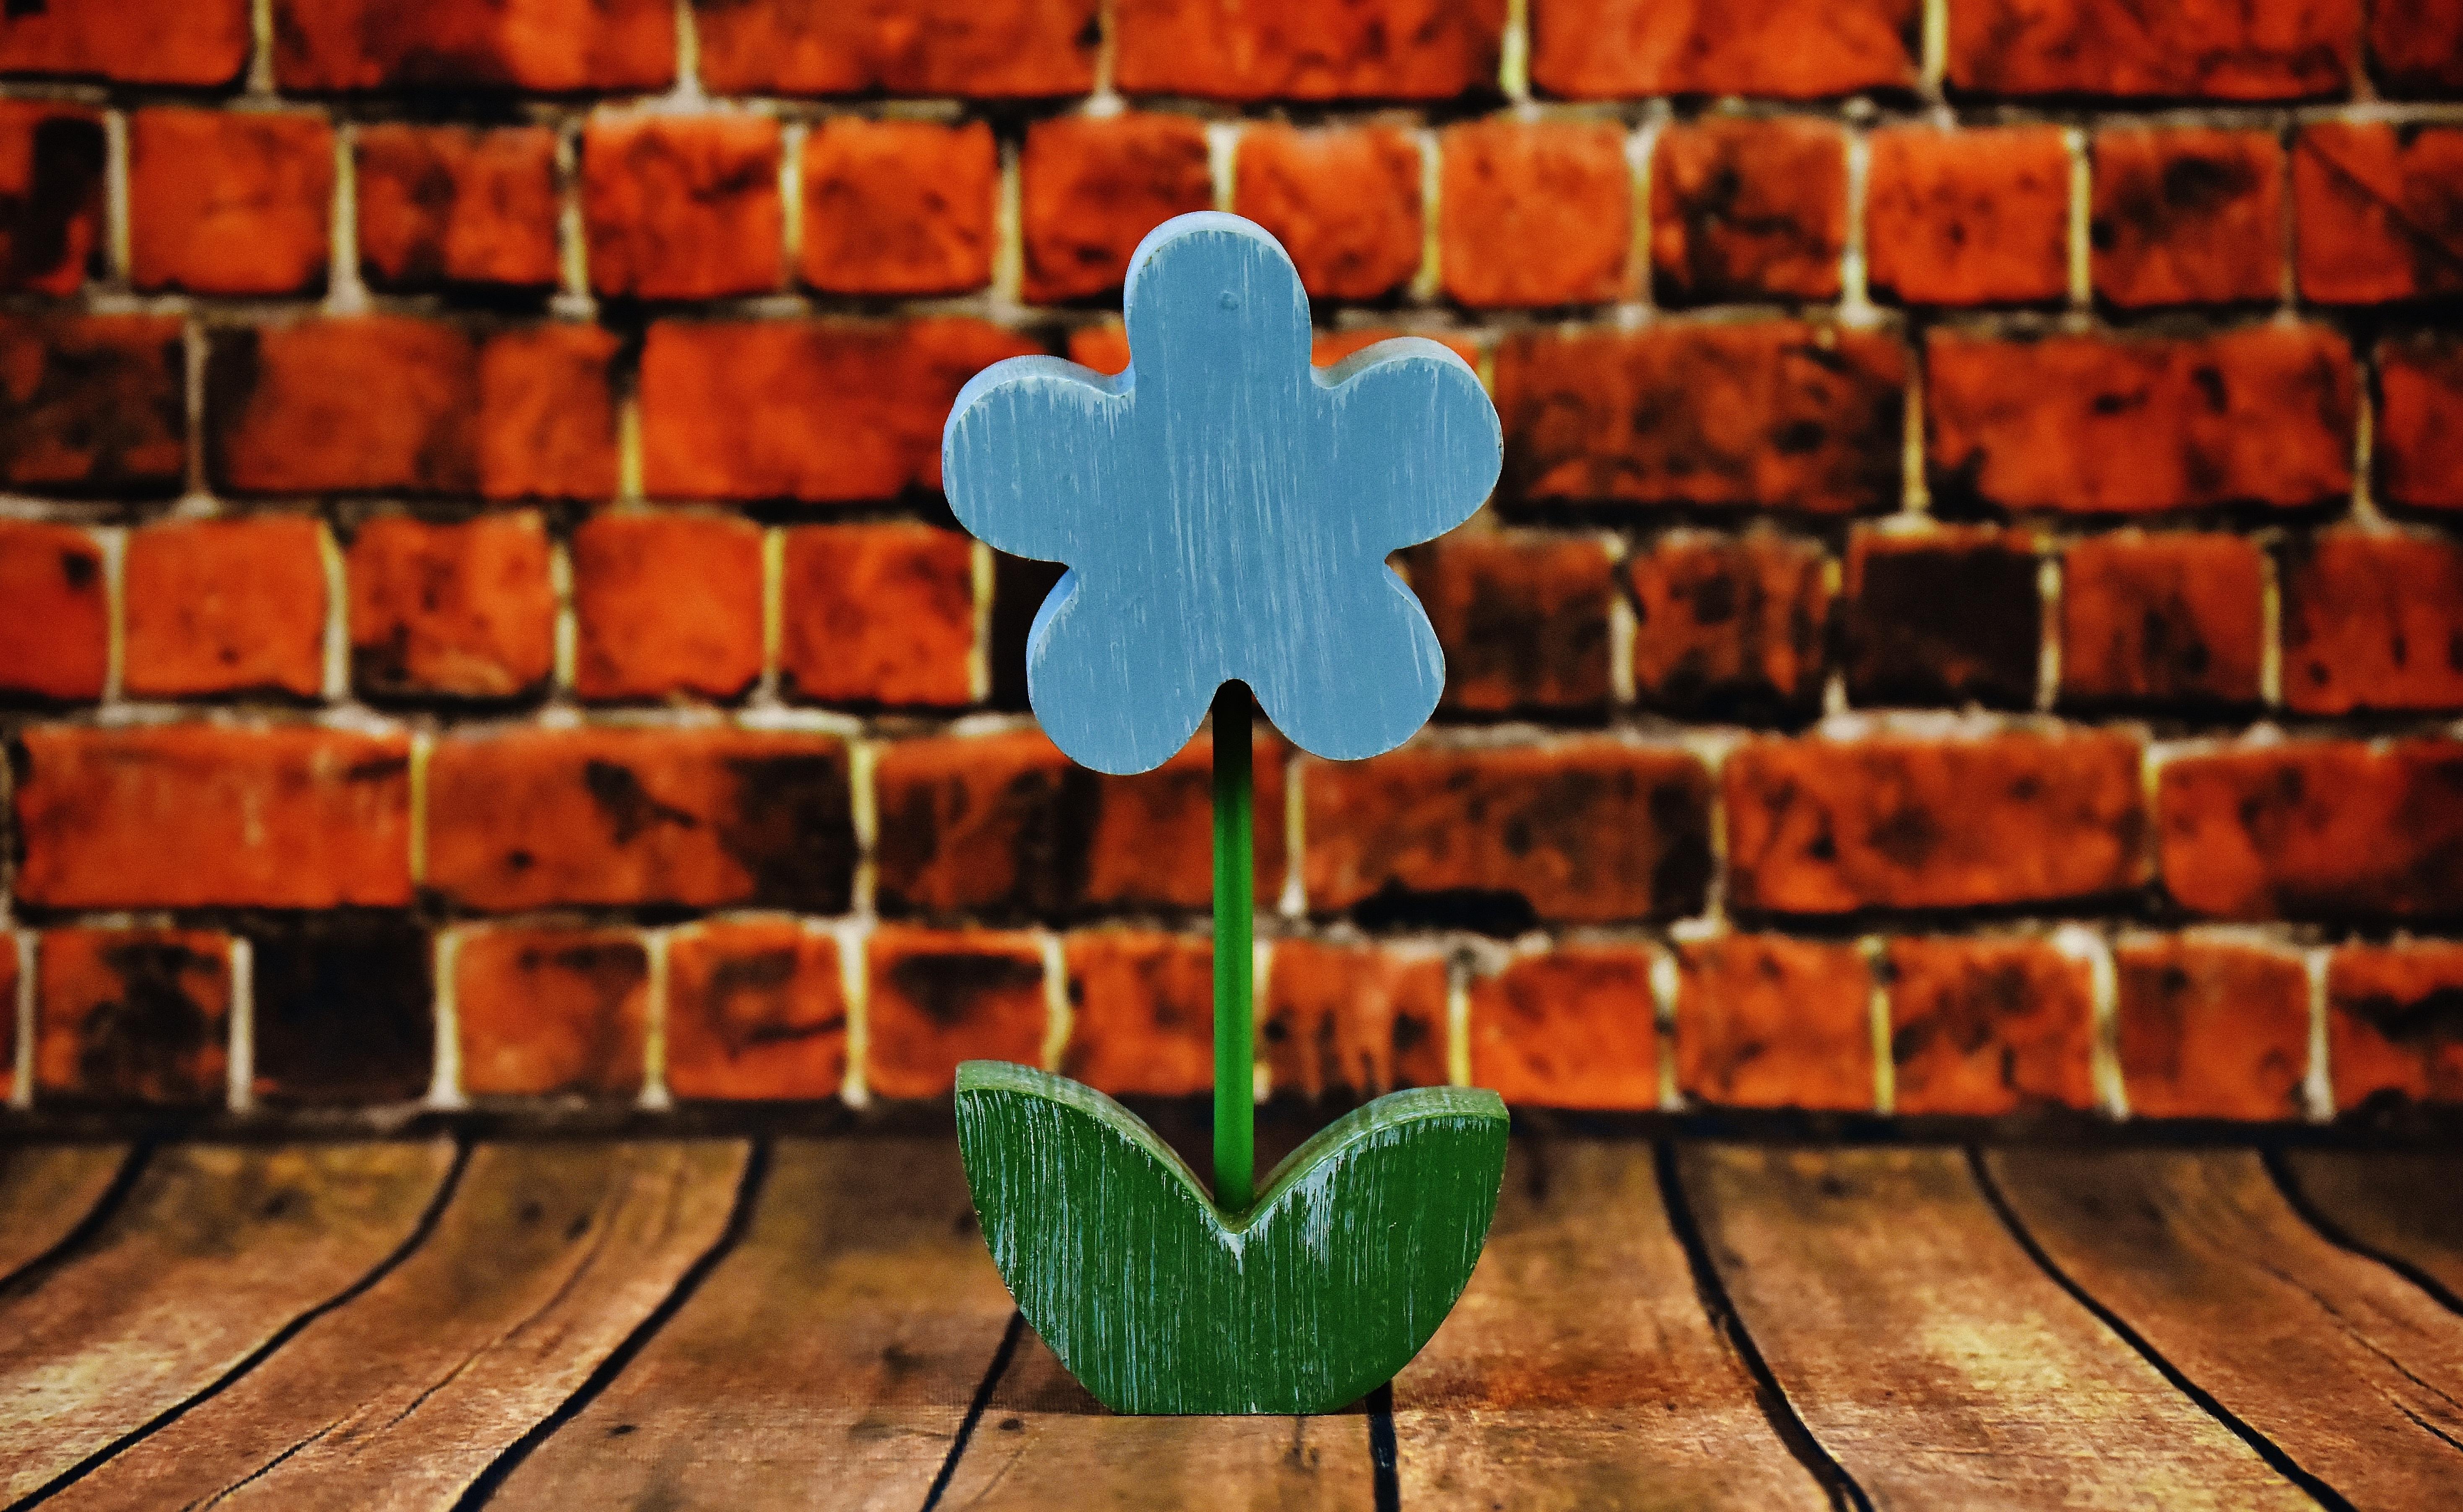 Kostenlose foto : Holz, Textur, Blatt, Blume, Mauer, Frühling, rot ...